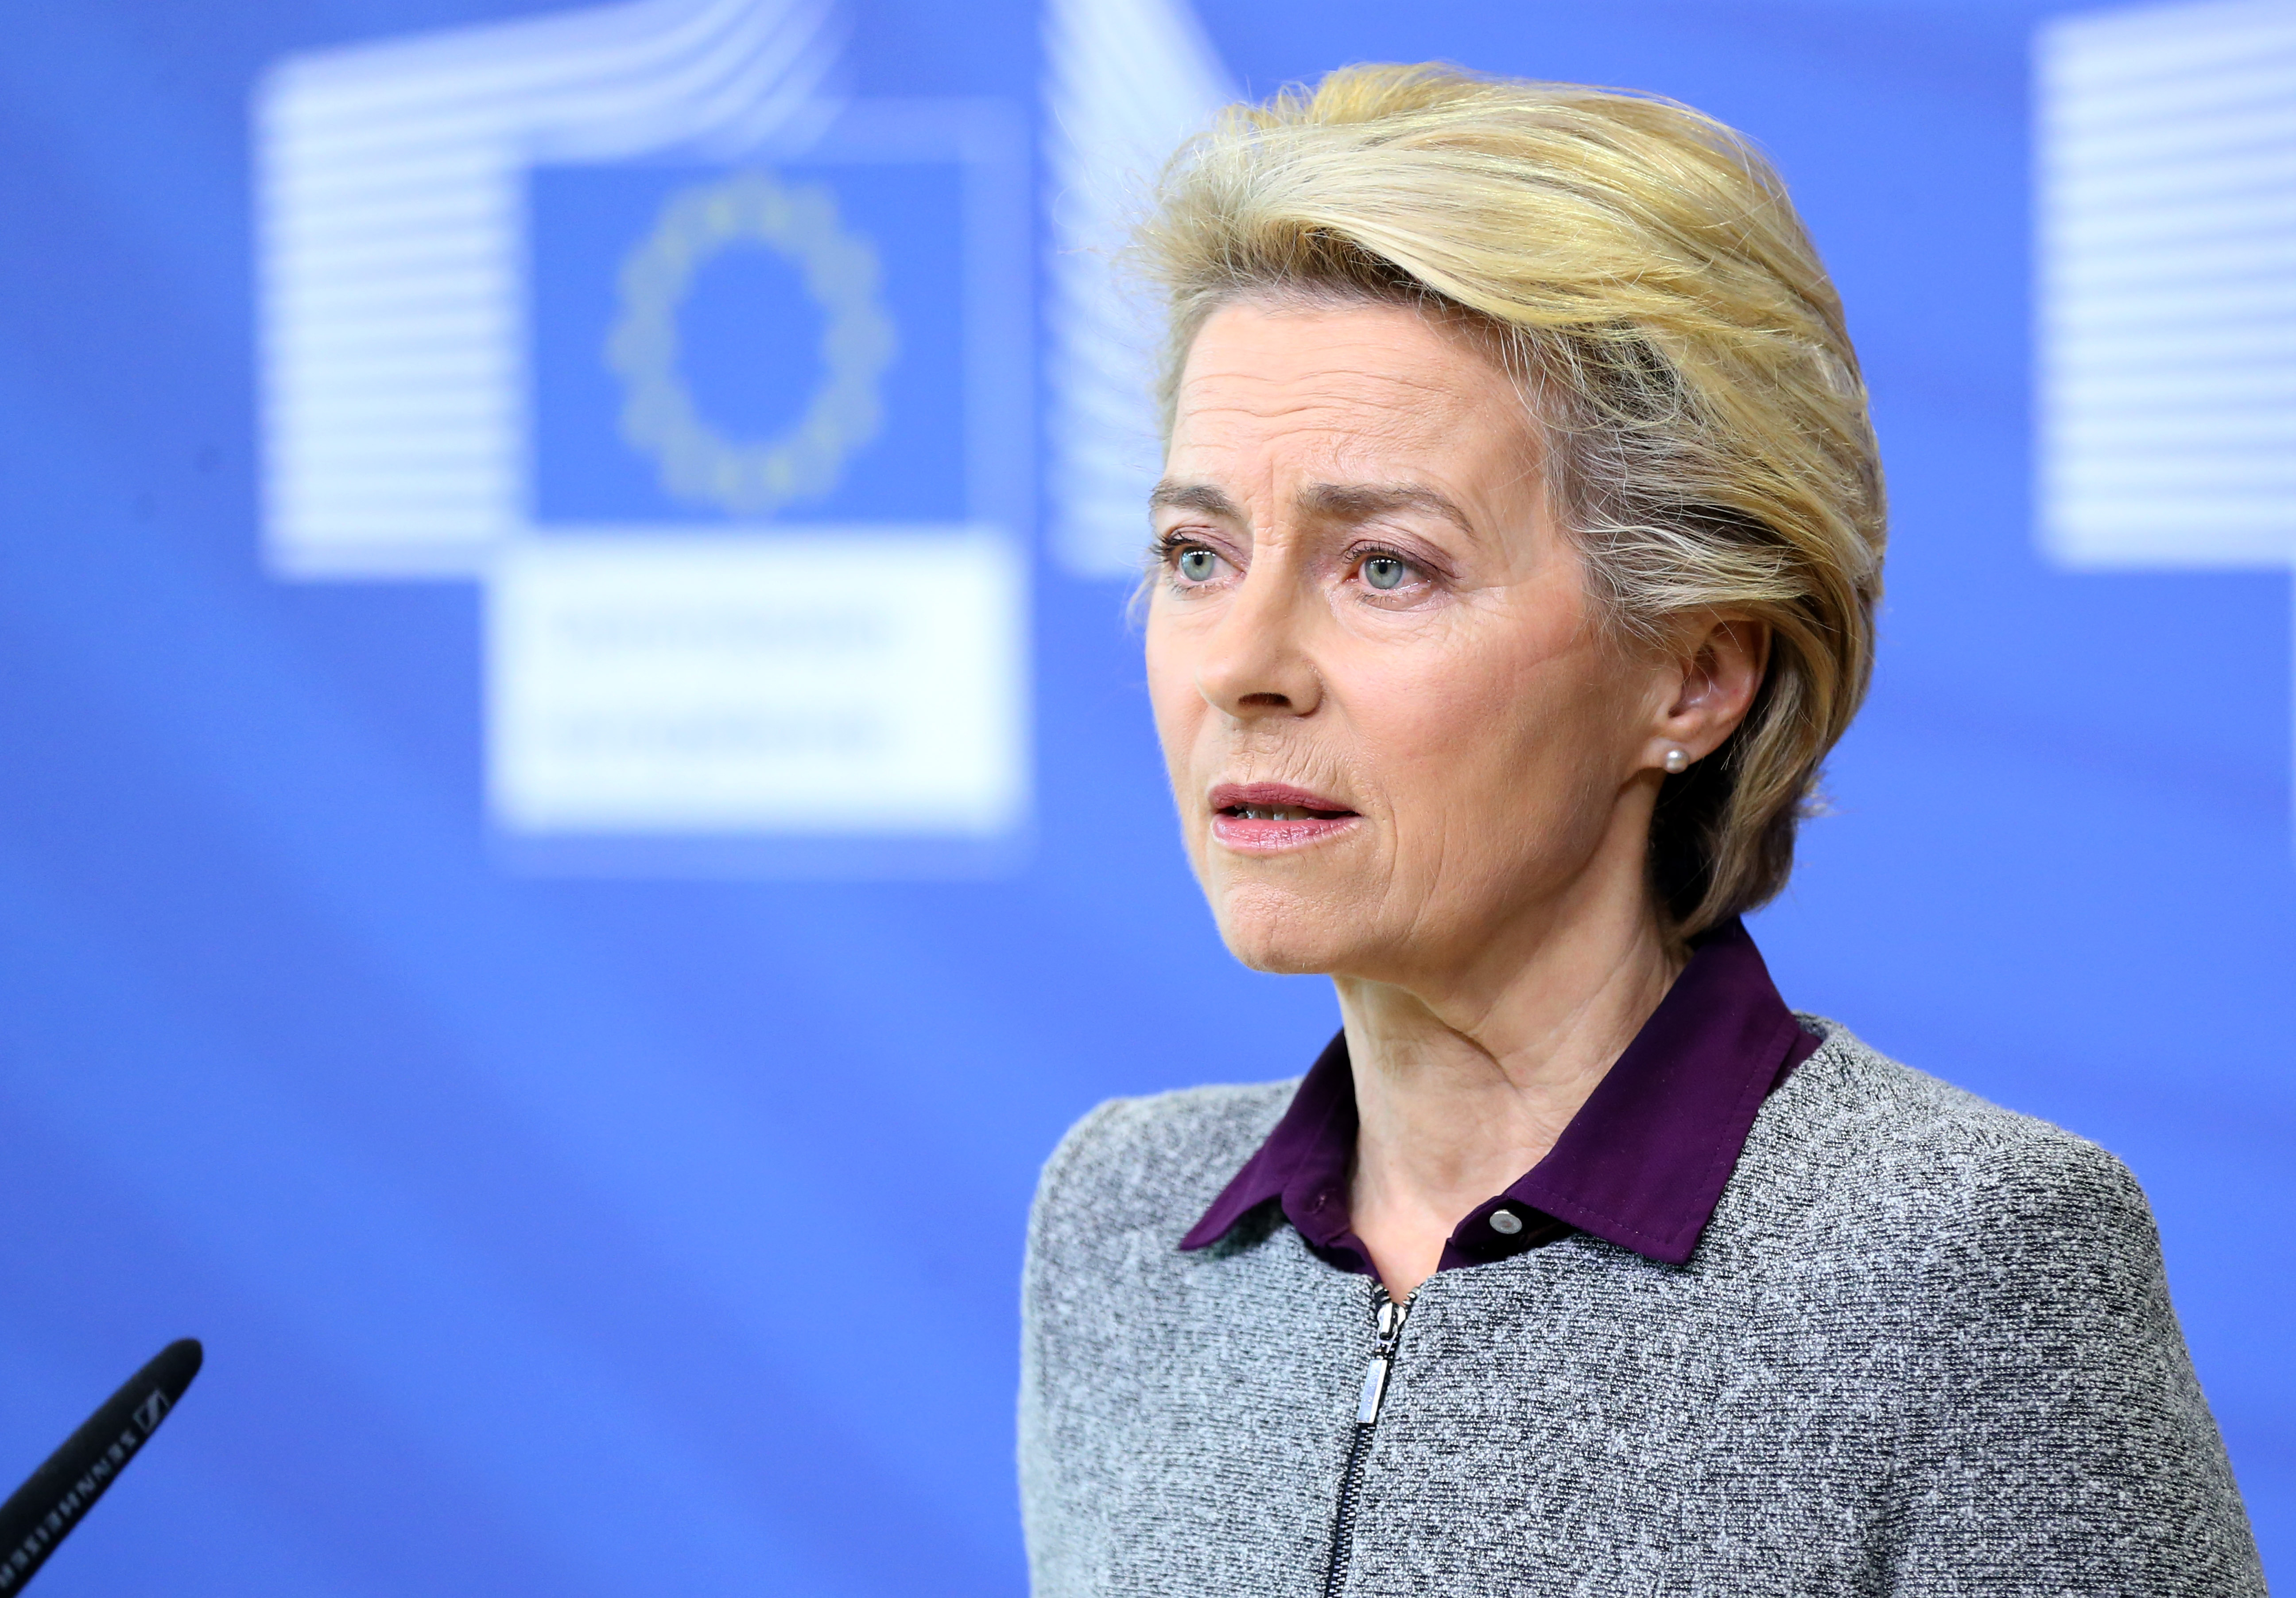 EU chief leaves summit to go into quarantine - My Vue News